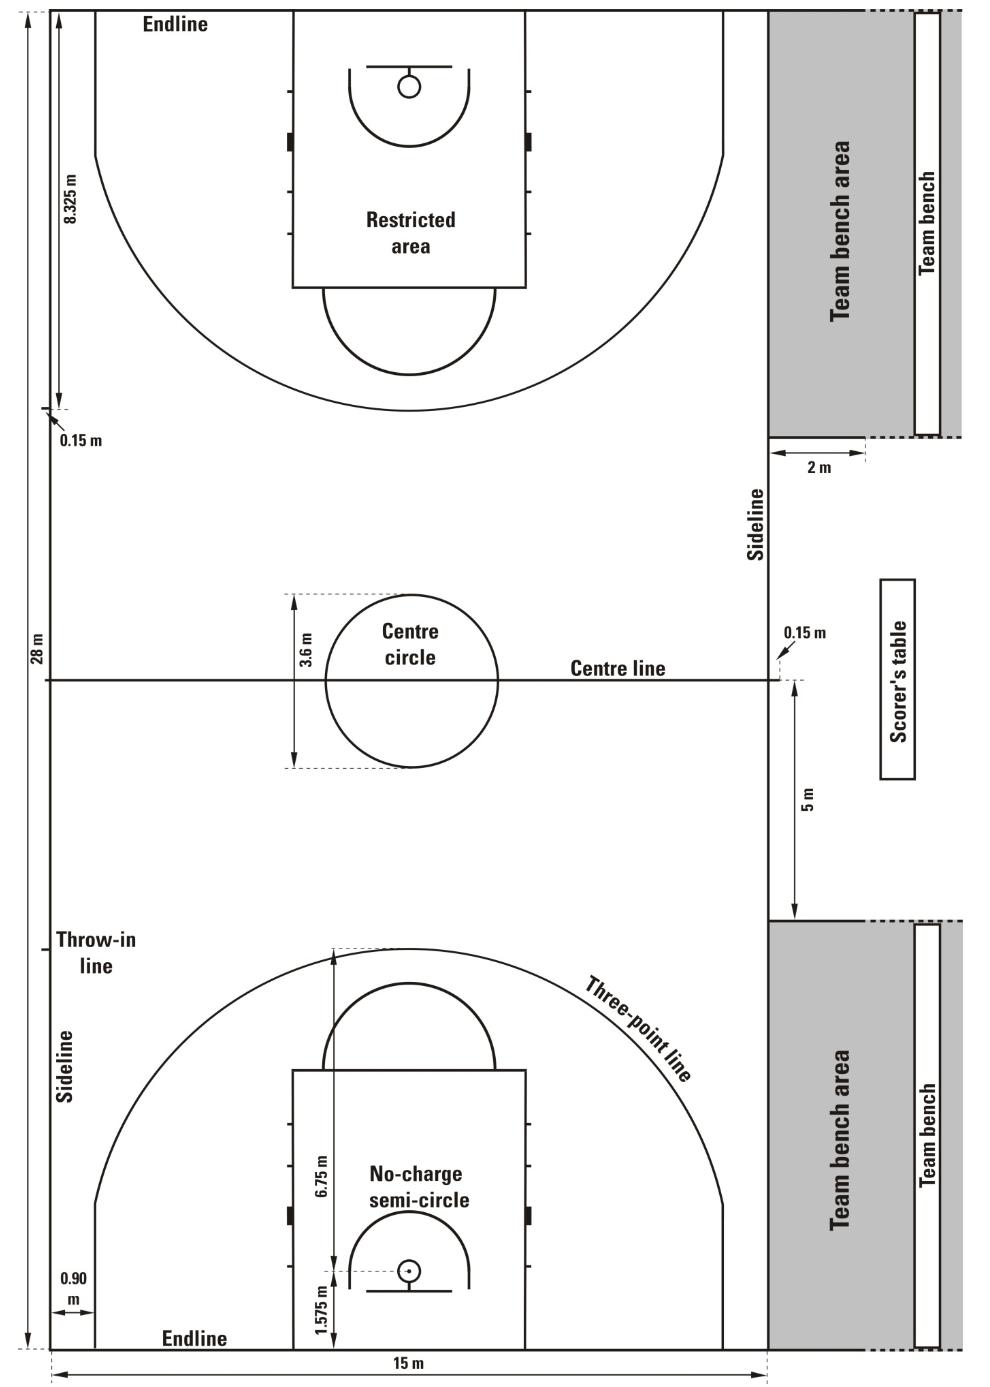 Ukuran Panjang Lapangan Bola Basket : ukuran, panjang, lapangan, basket, Ukuran, Lapangan, Basket, Tinggi, Gambar, [LENGKAP]